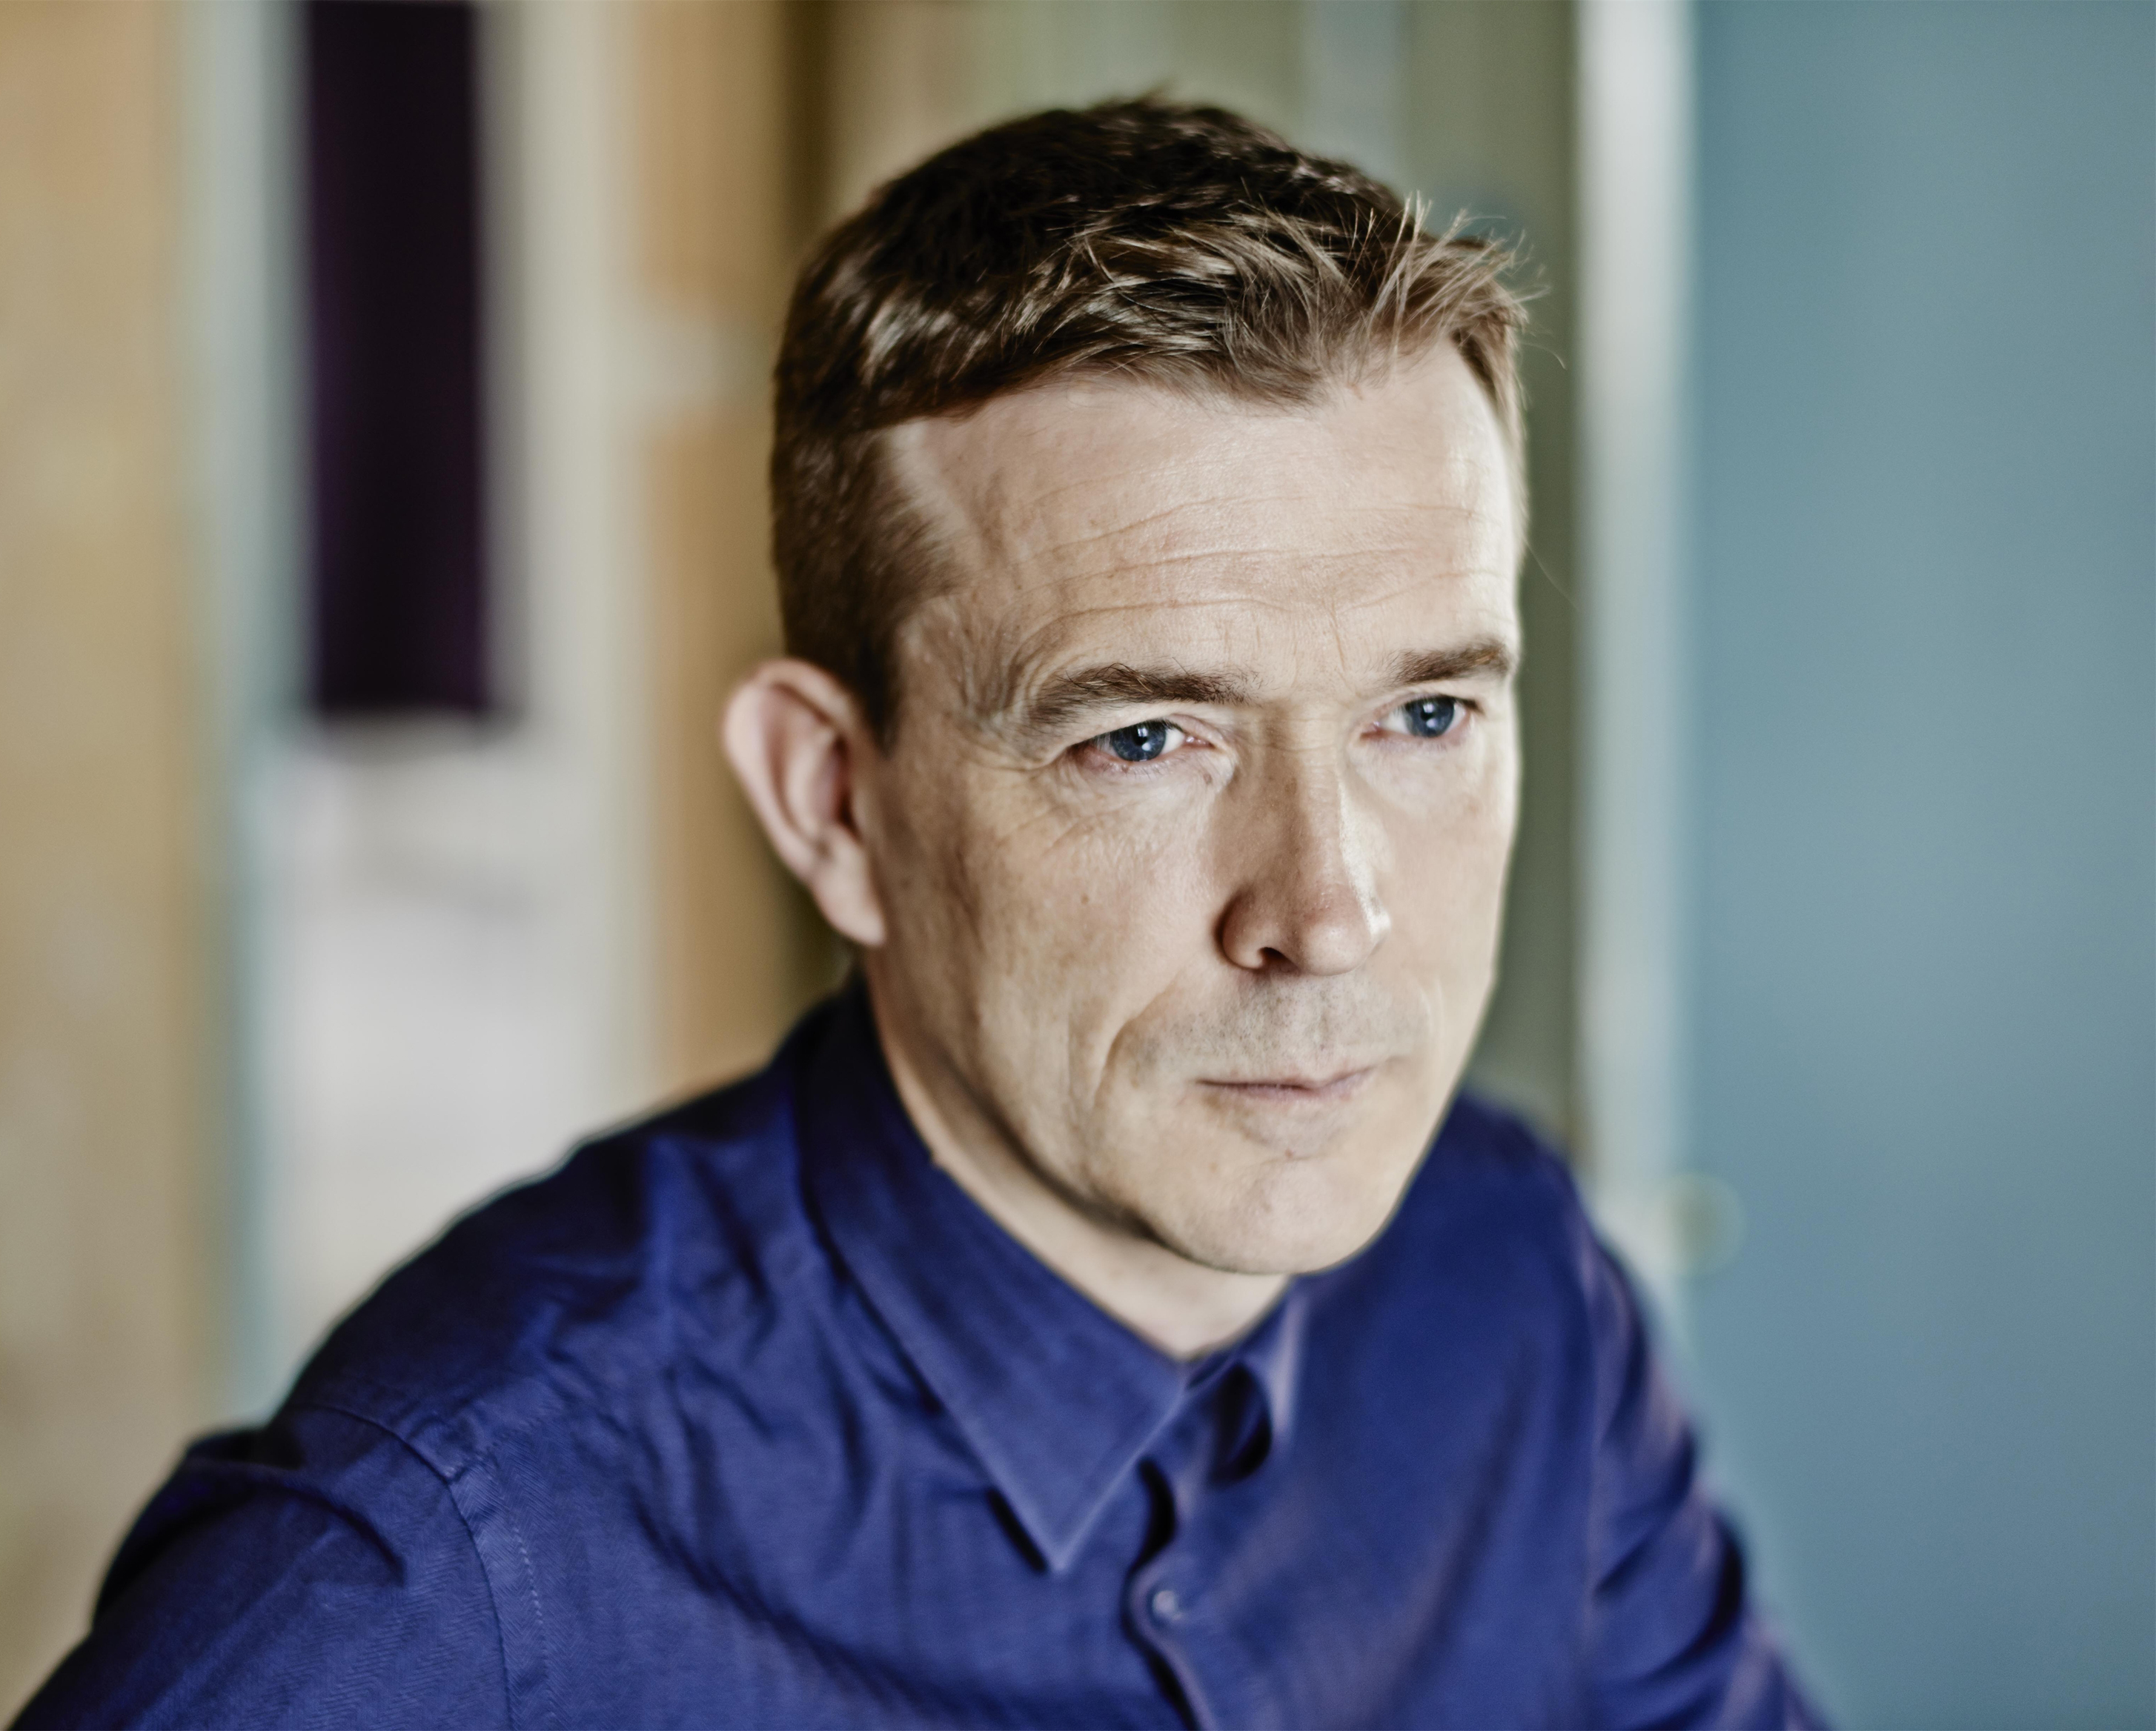 Acclaimed author David Mitchell (Paul Stuart/PA)